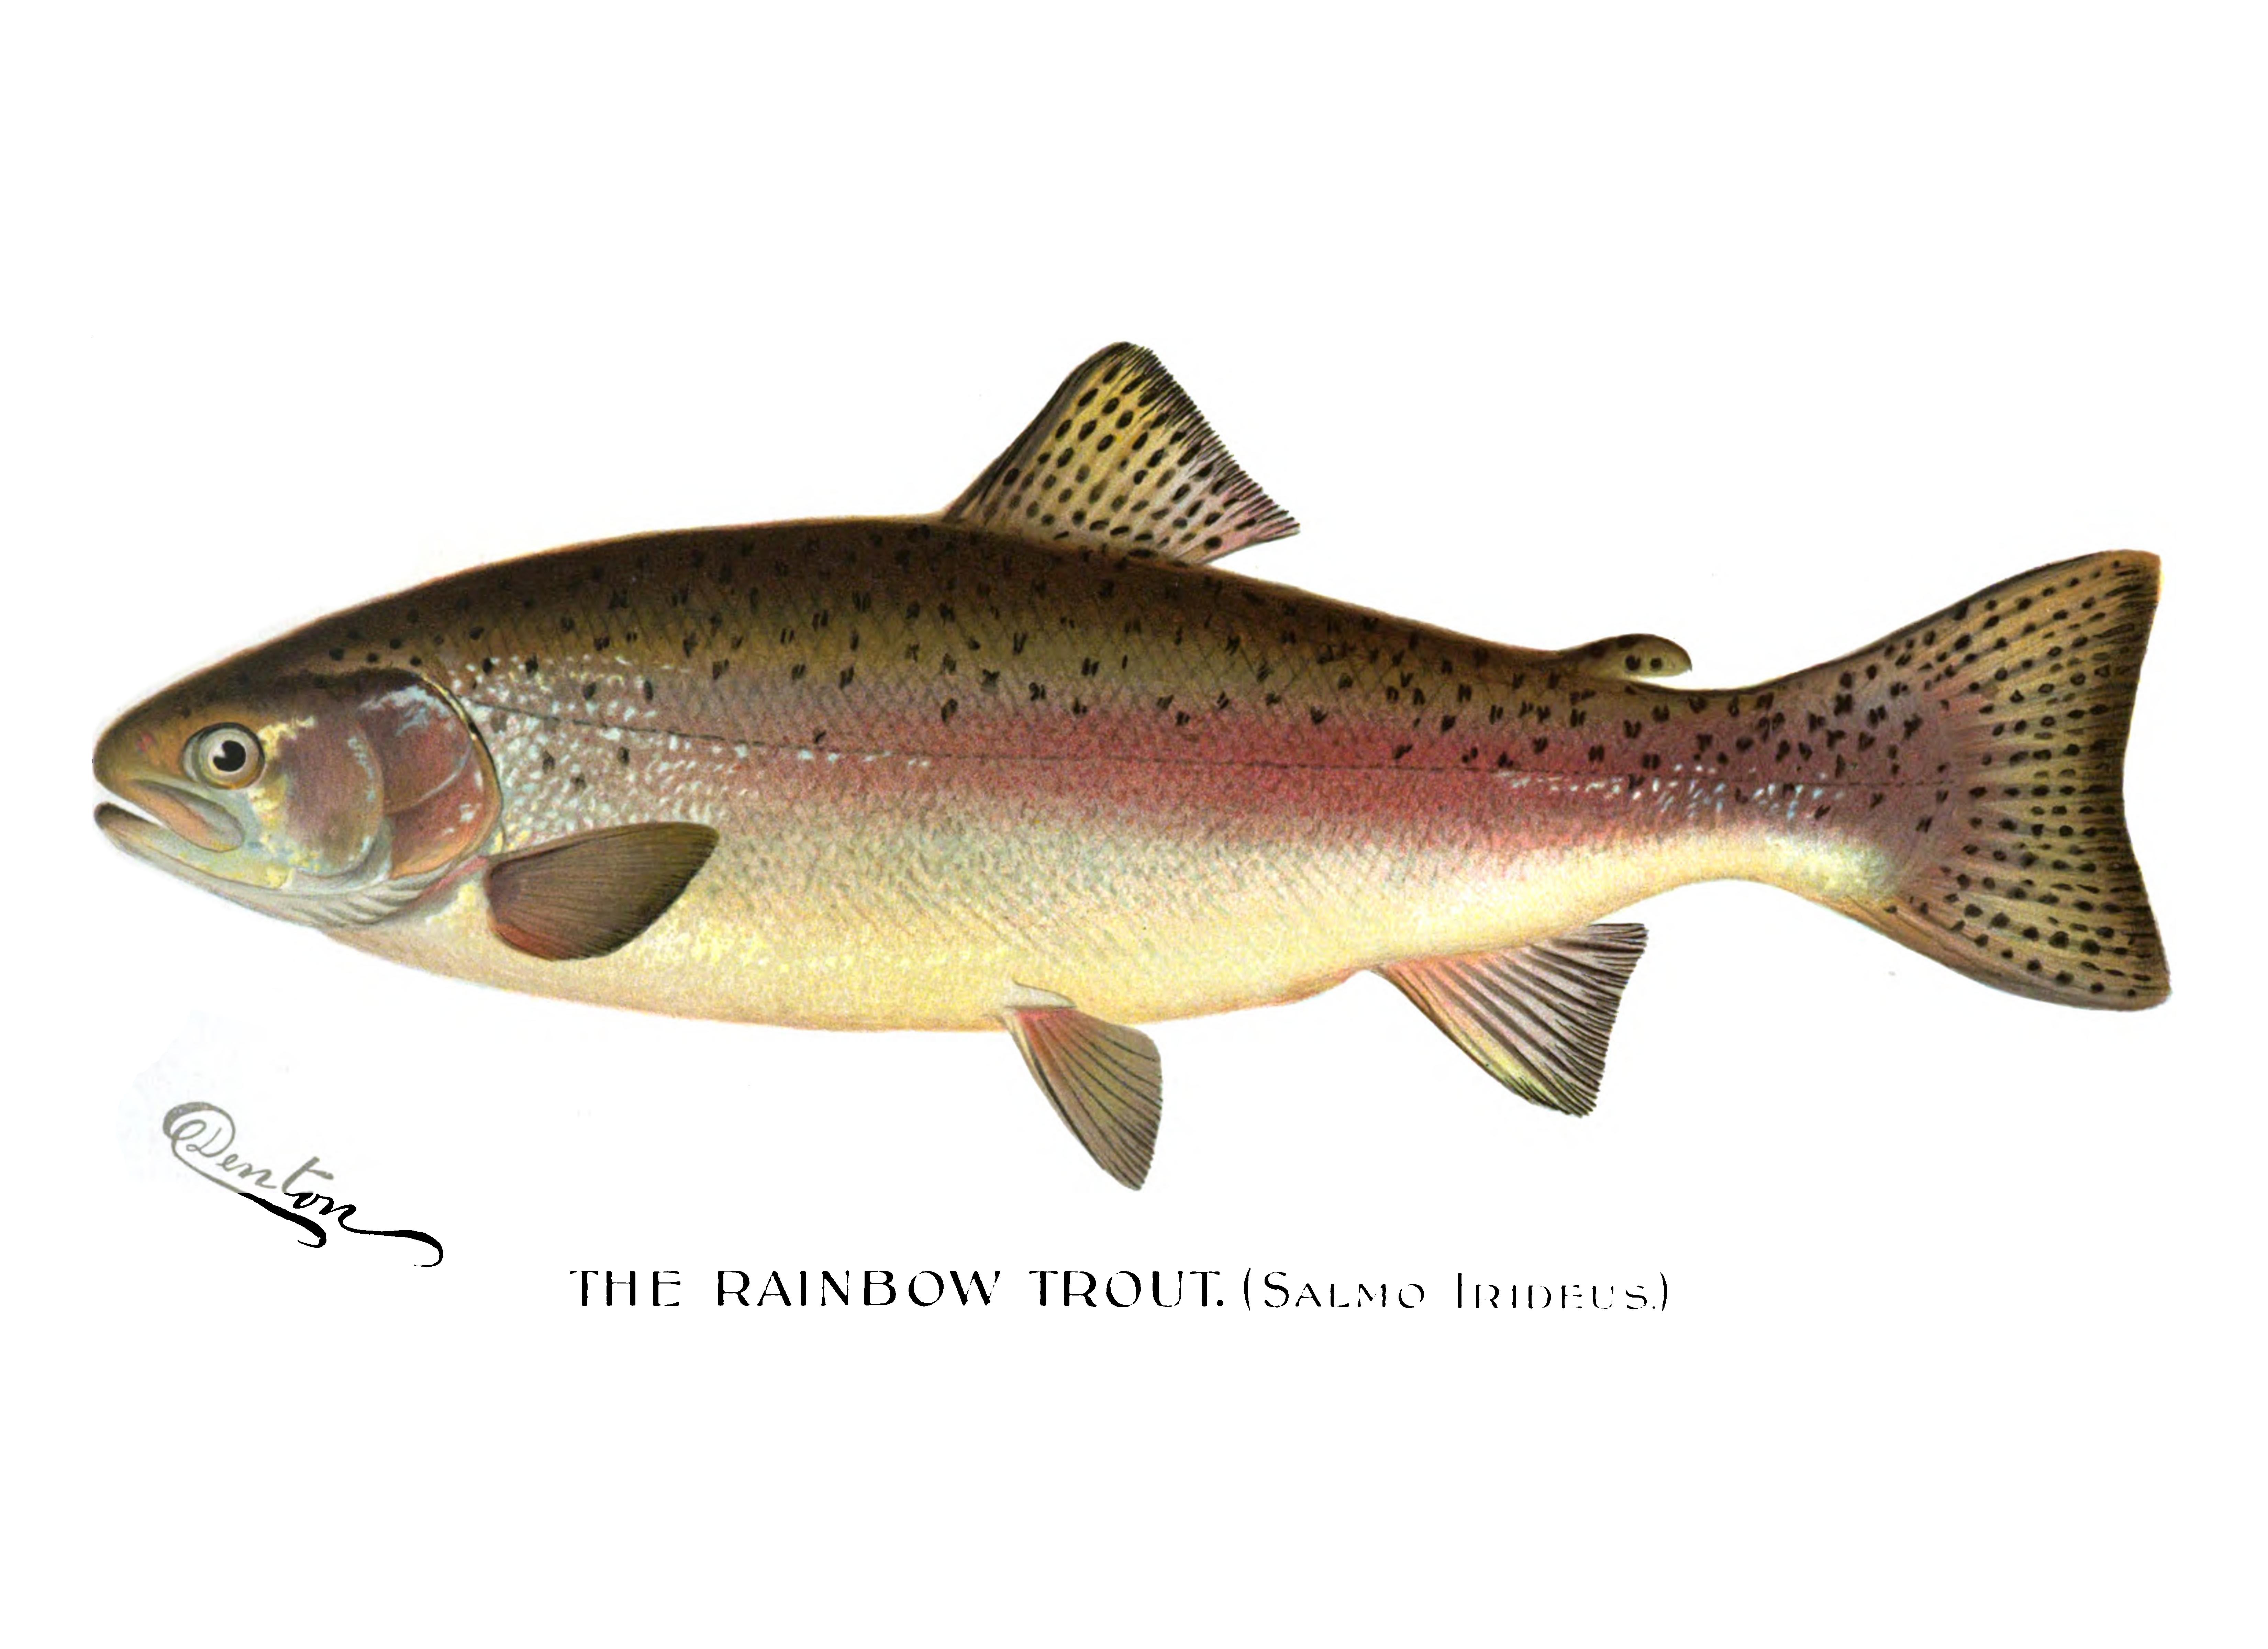 File:Denton Rainbow Trout 1896.png.